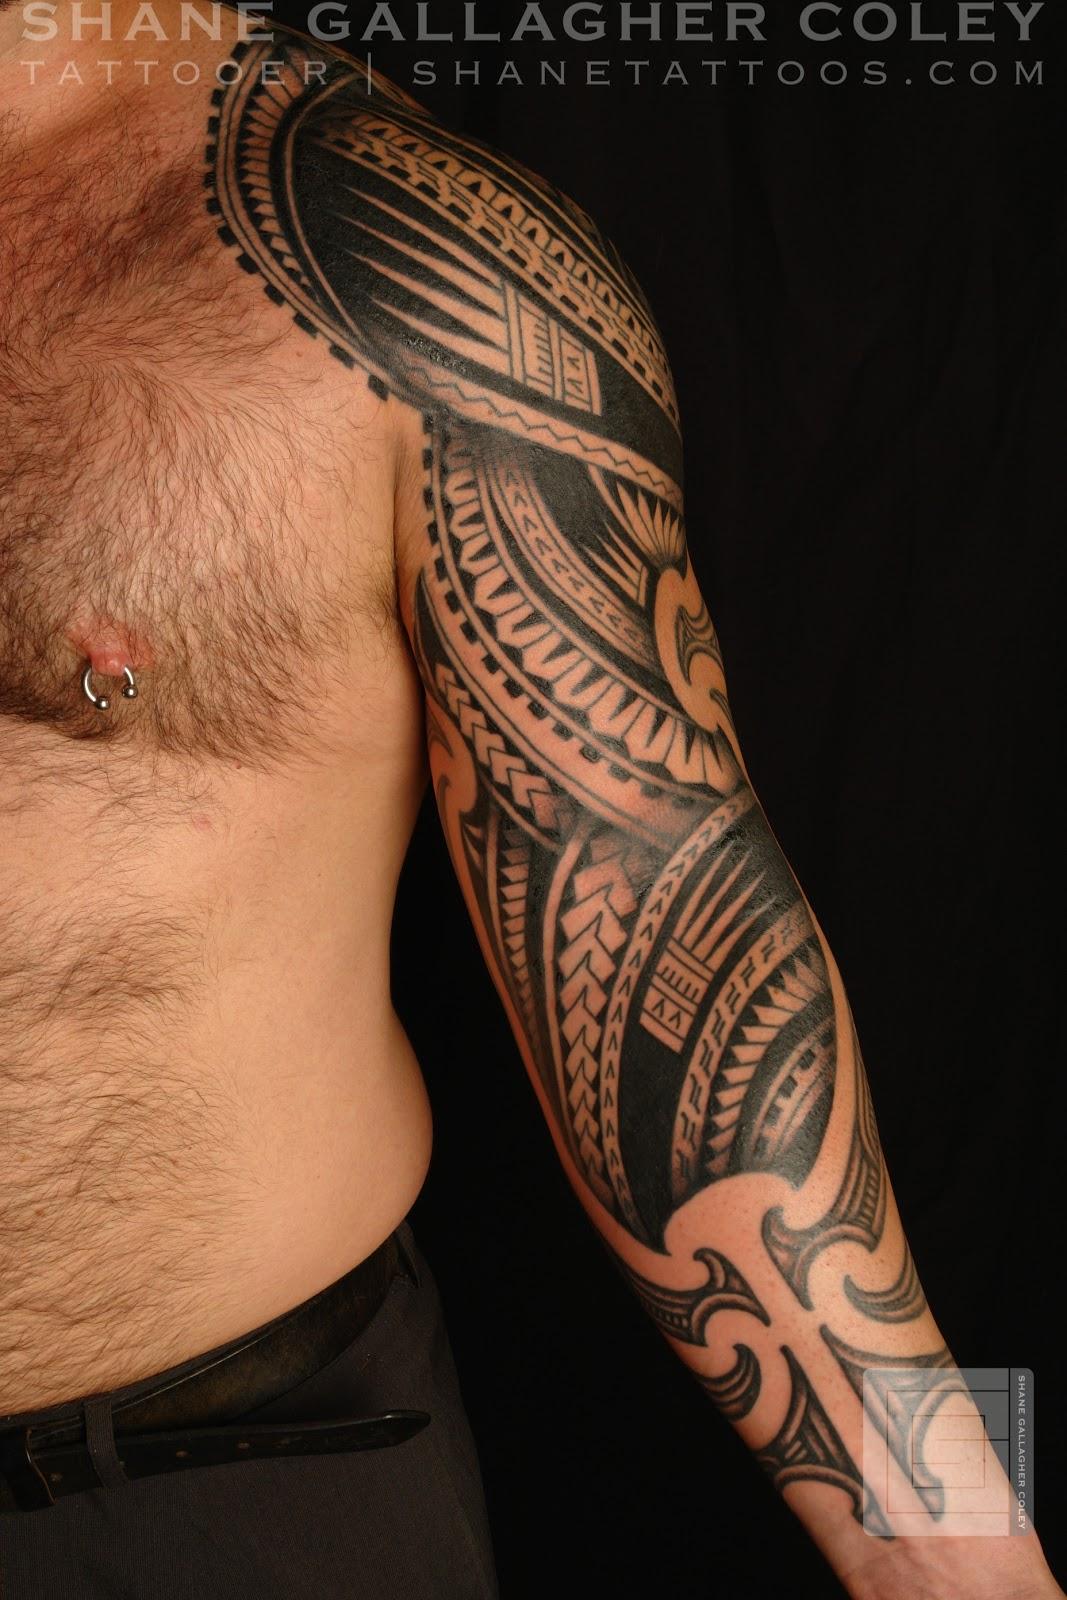 maori polynesian tattoo half maori half polynesian sleeve tattoo. Black Bedroom Furniture Sets. Home Design Ideas